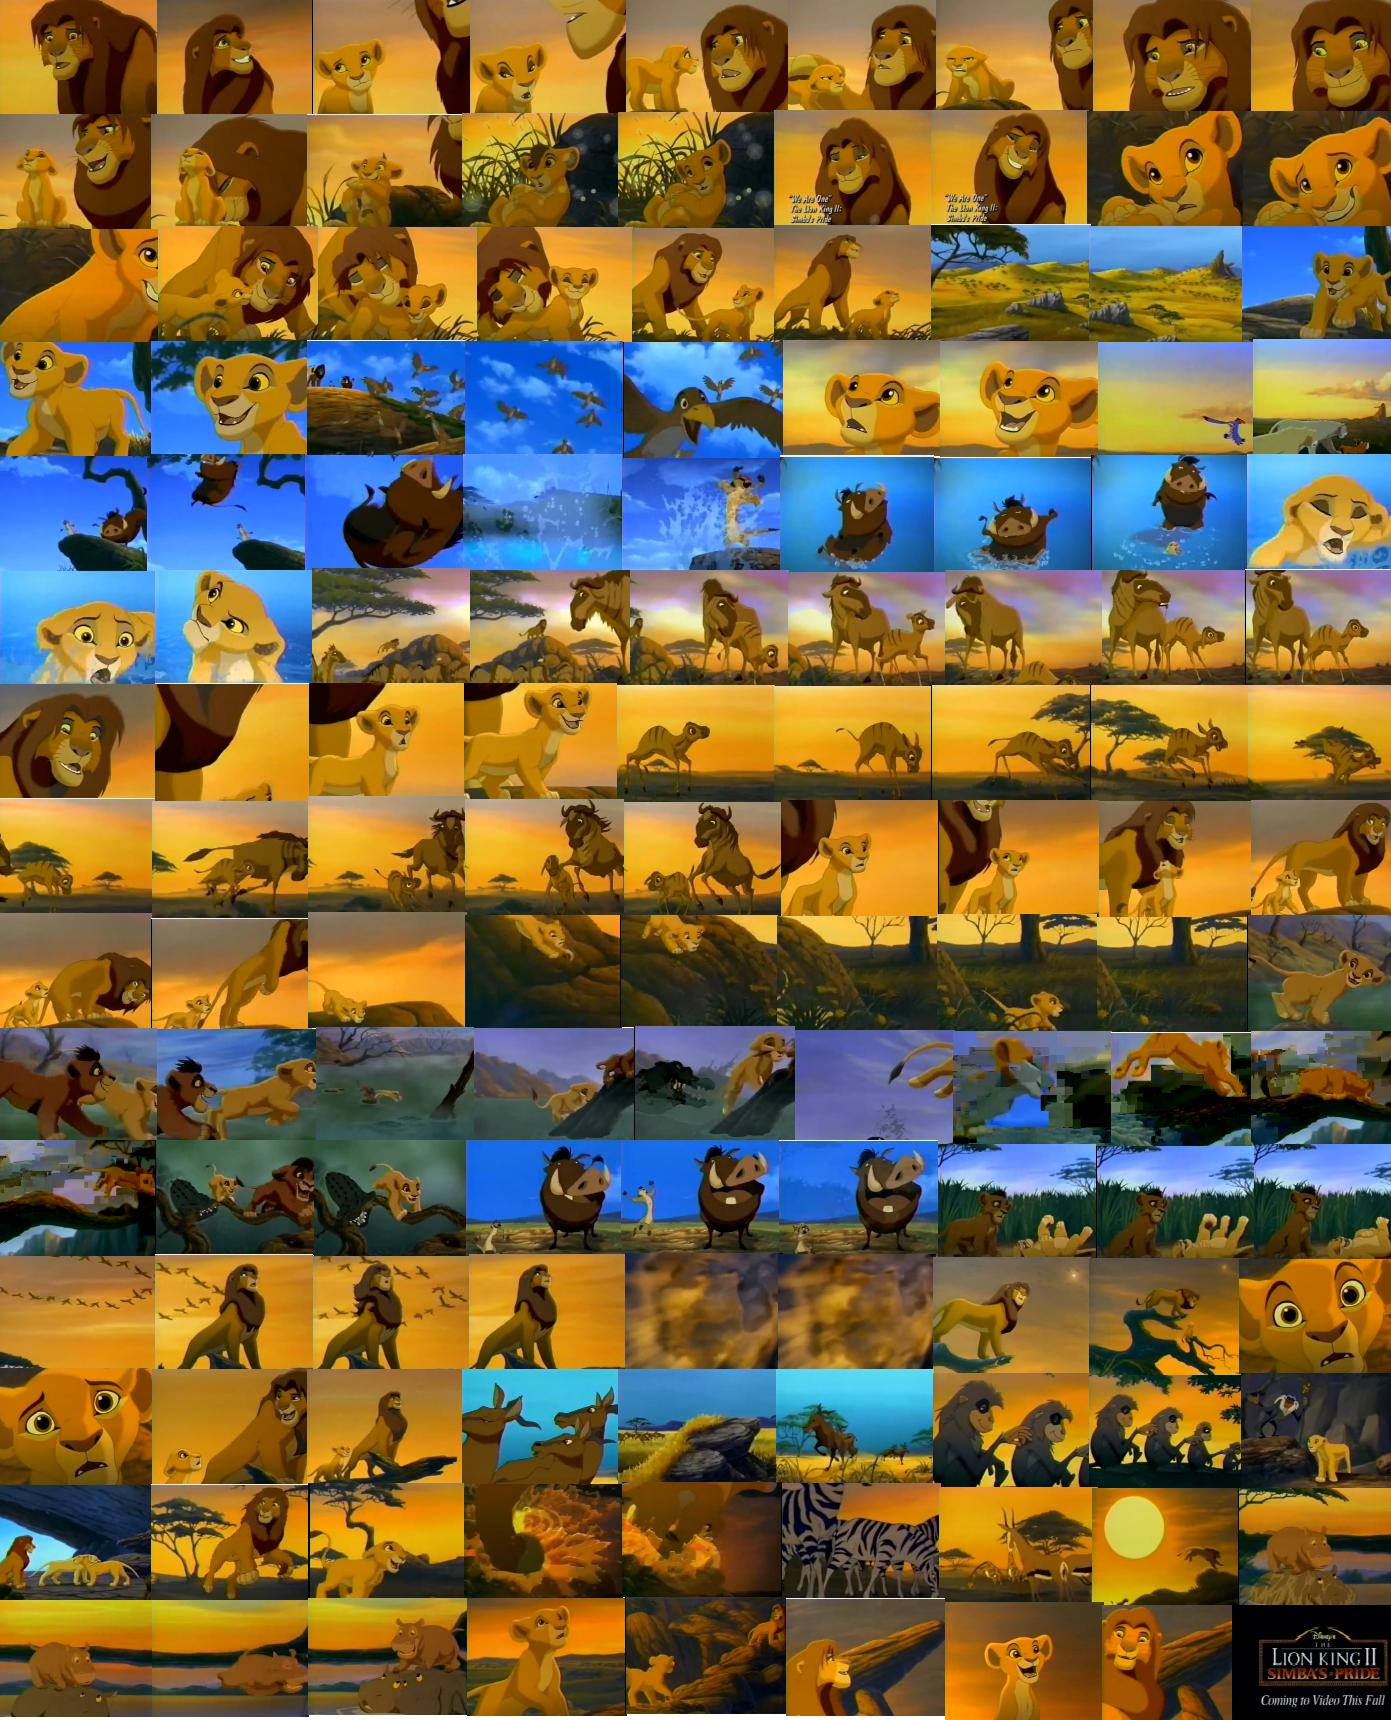 Simba's Pride May 10th xem trước collage